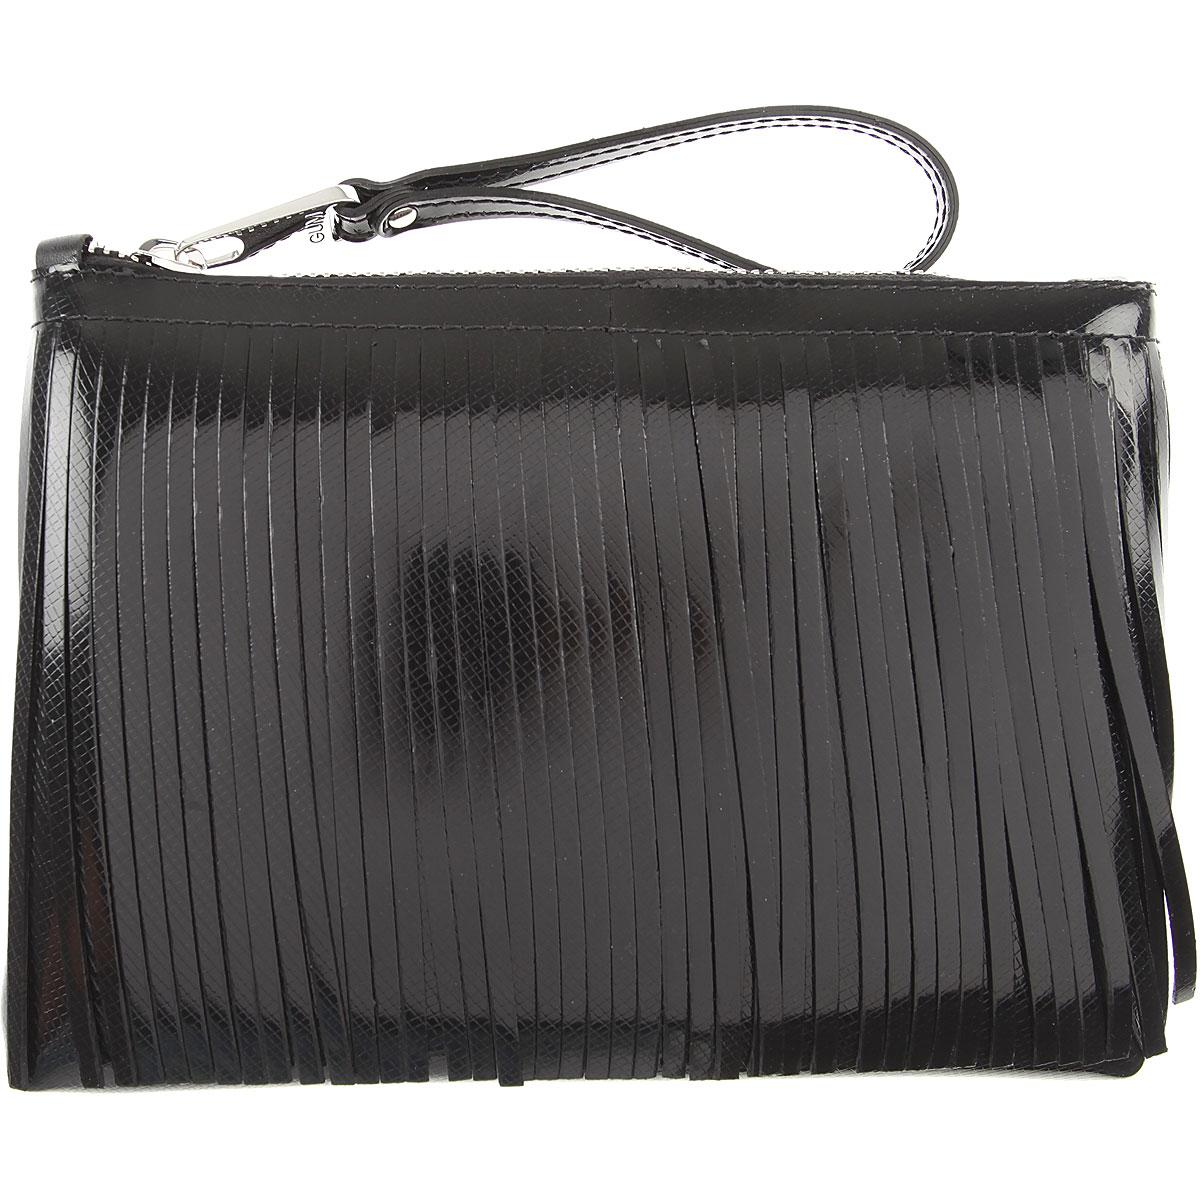 Image of GUM Gianni Chiarini Design Women\'s Pouch, Black, Patent Leather, 2017